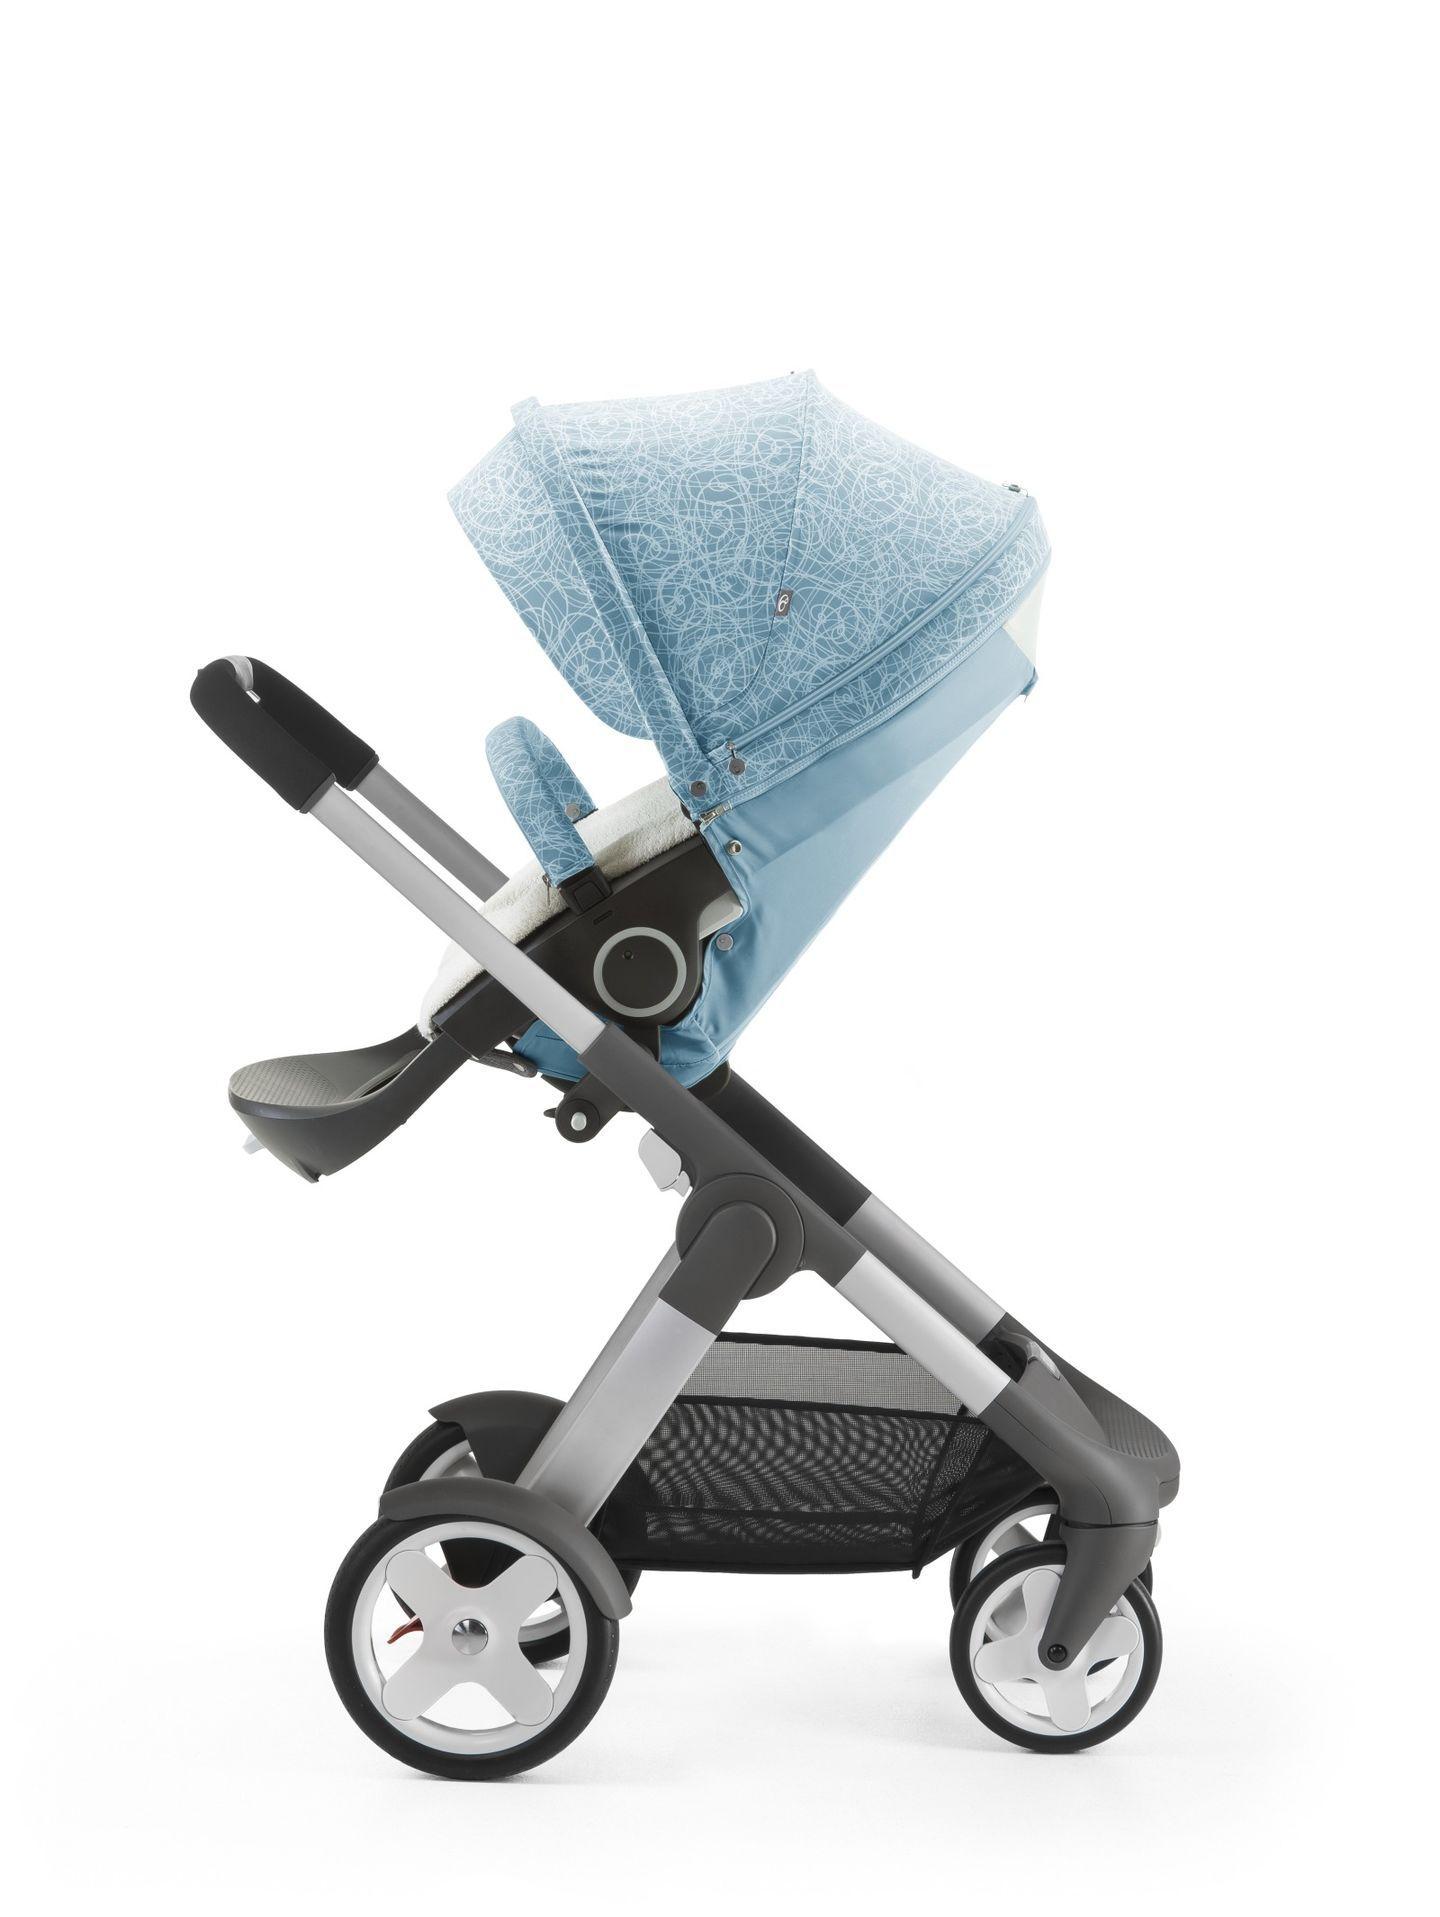 Stroller Summer Kit Salty Blue Baby prams, Baby